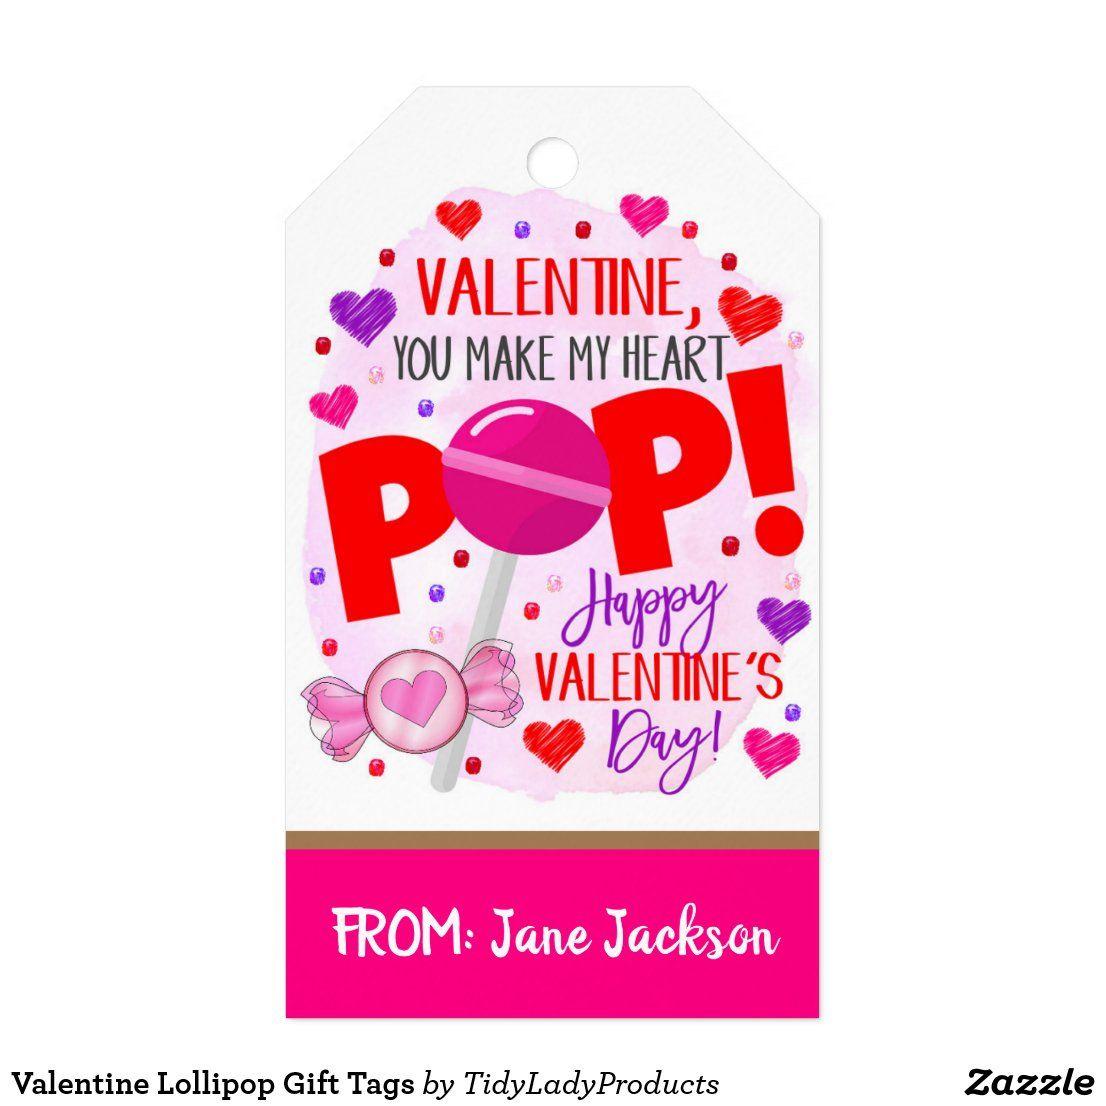 Valentine Lollipop Gift Tags